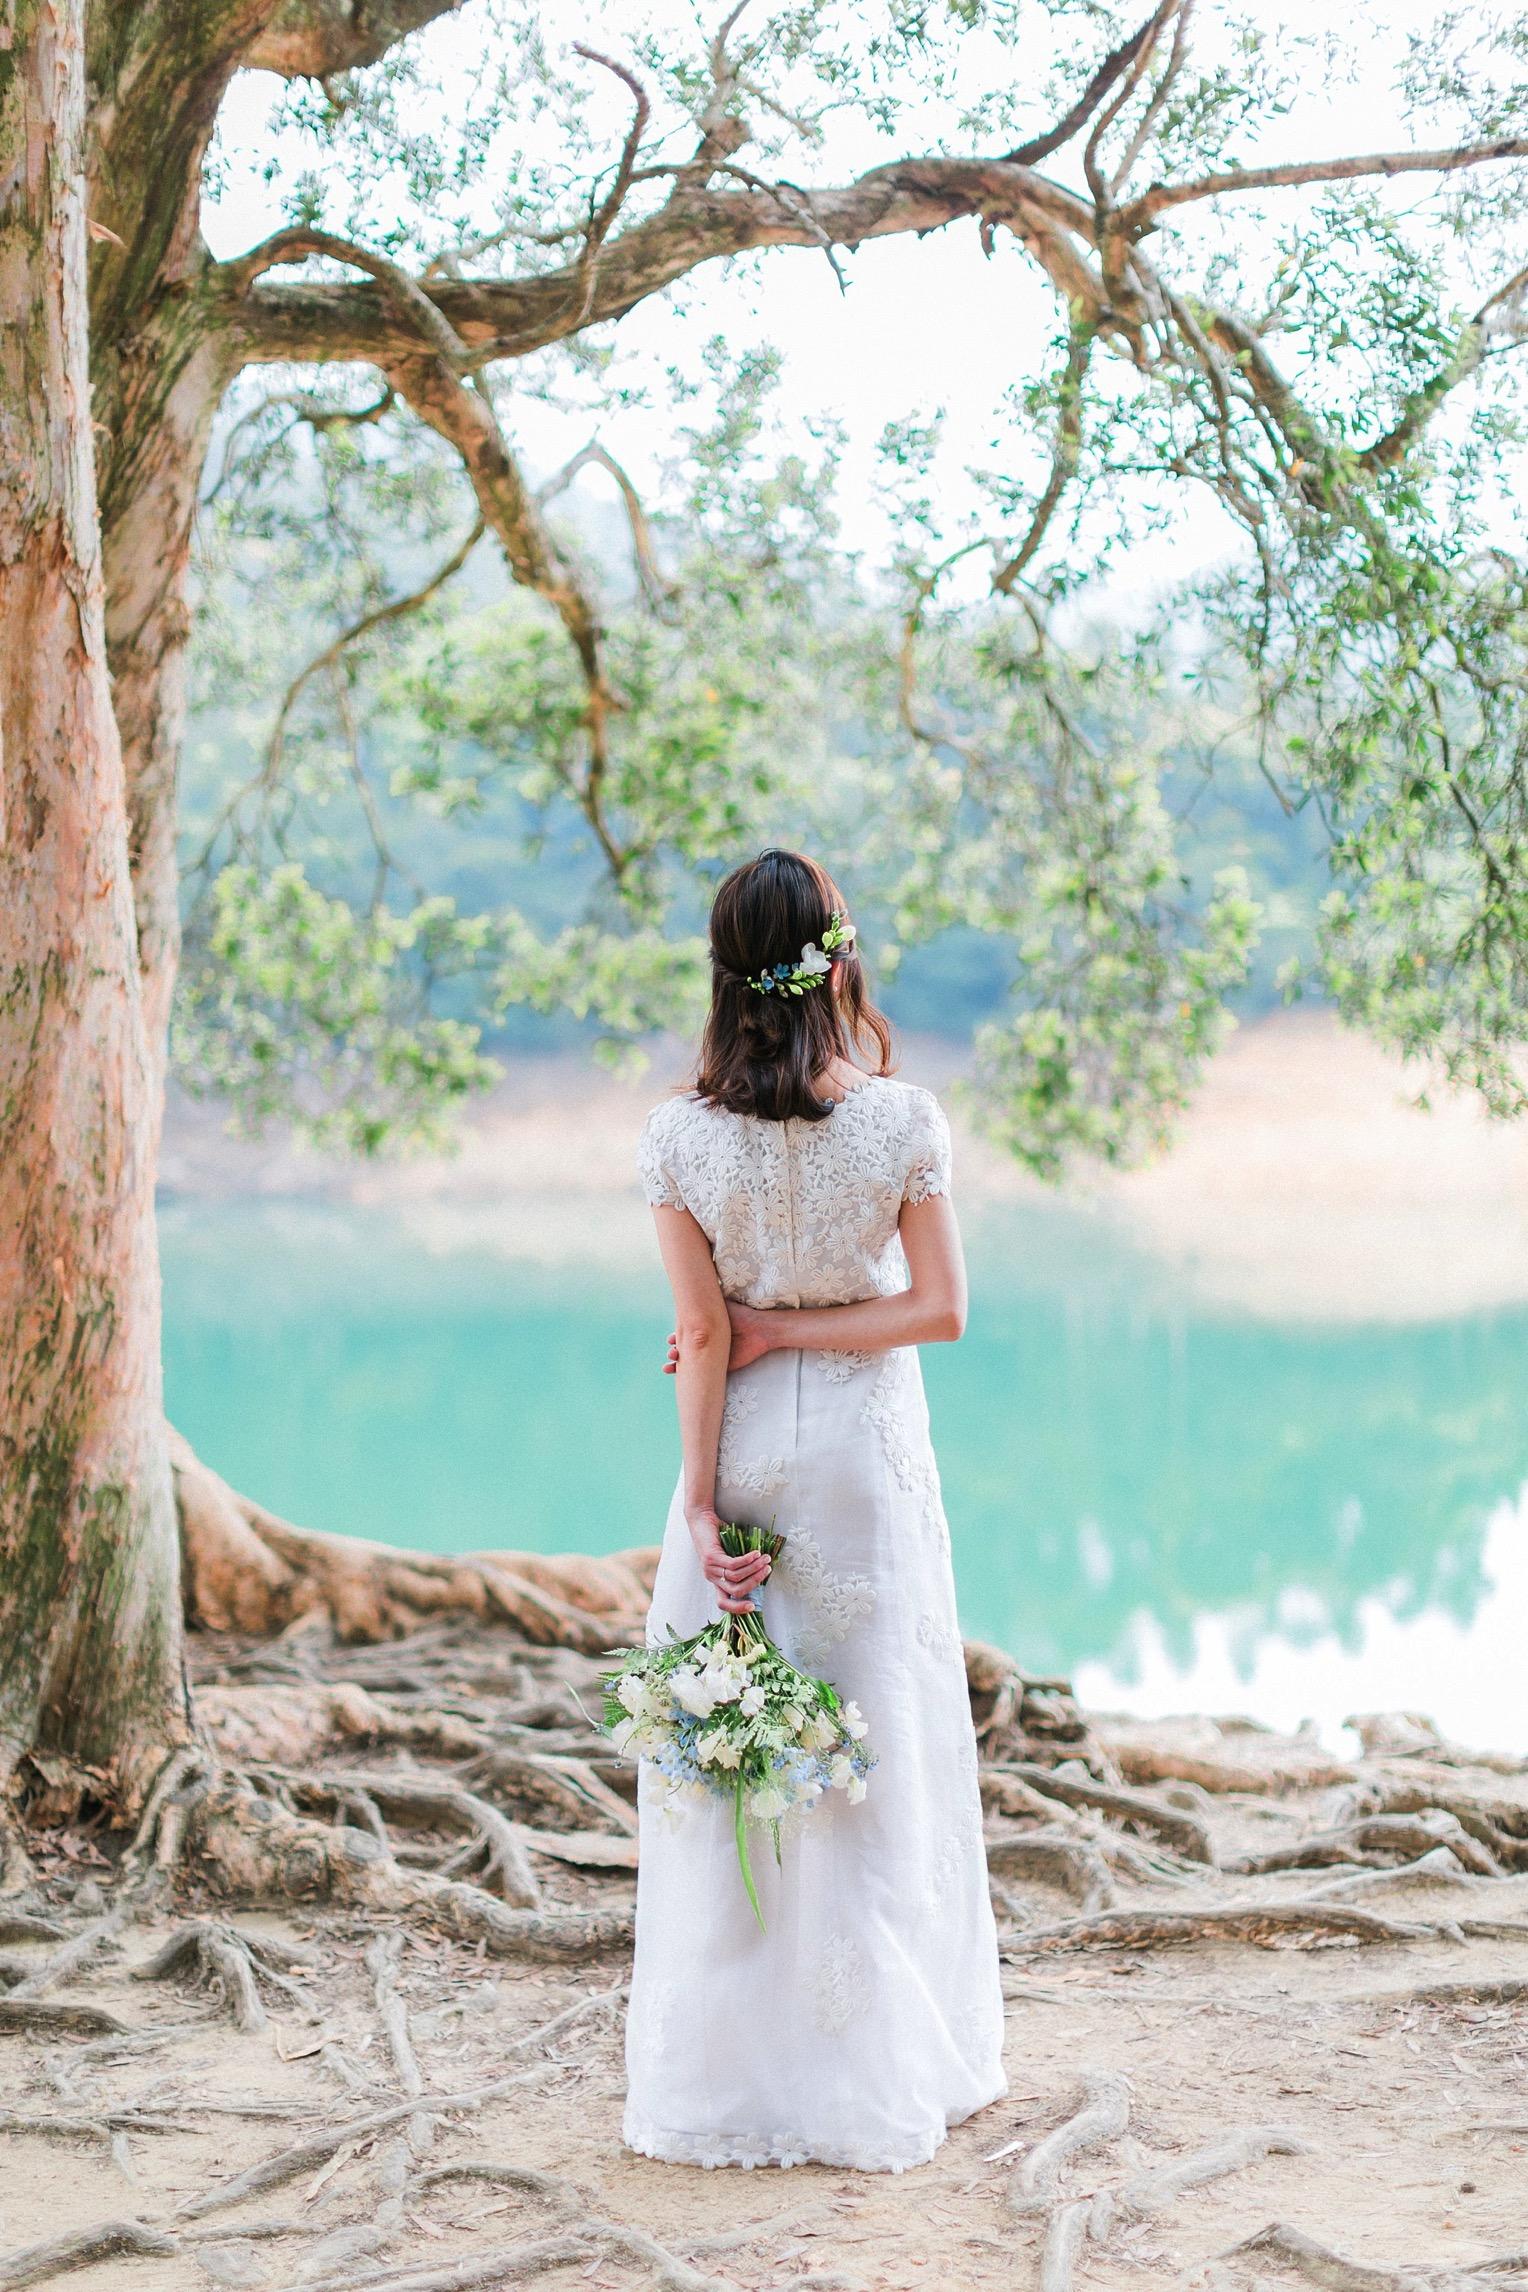 French Grey Photography Hong Kong Prewedding8